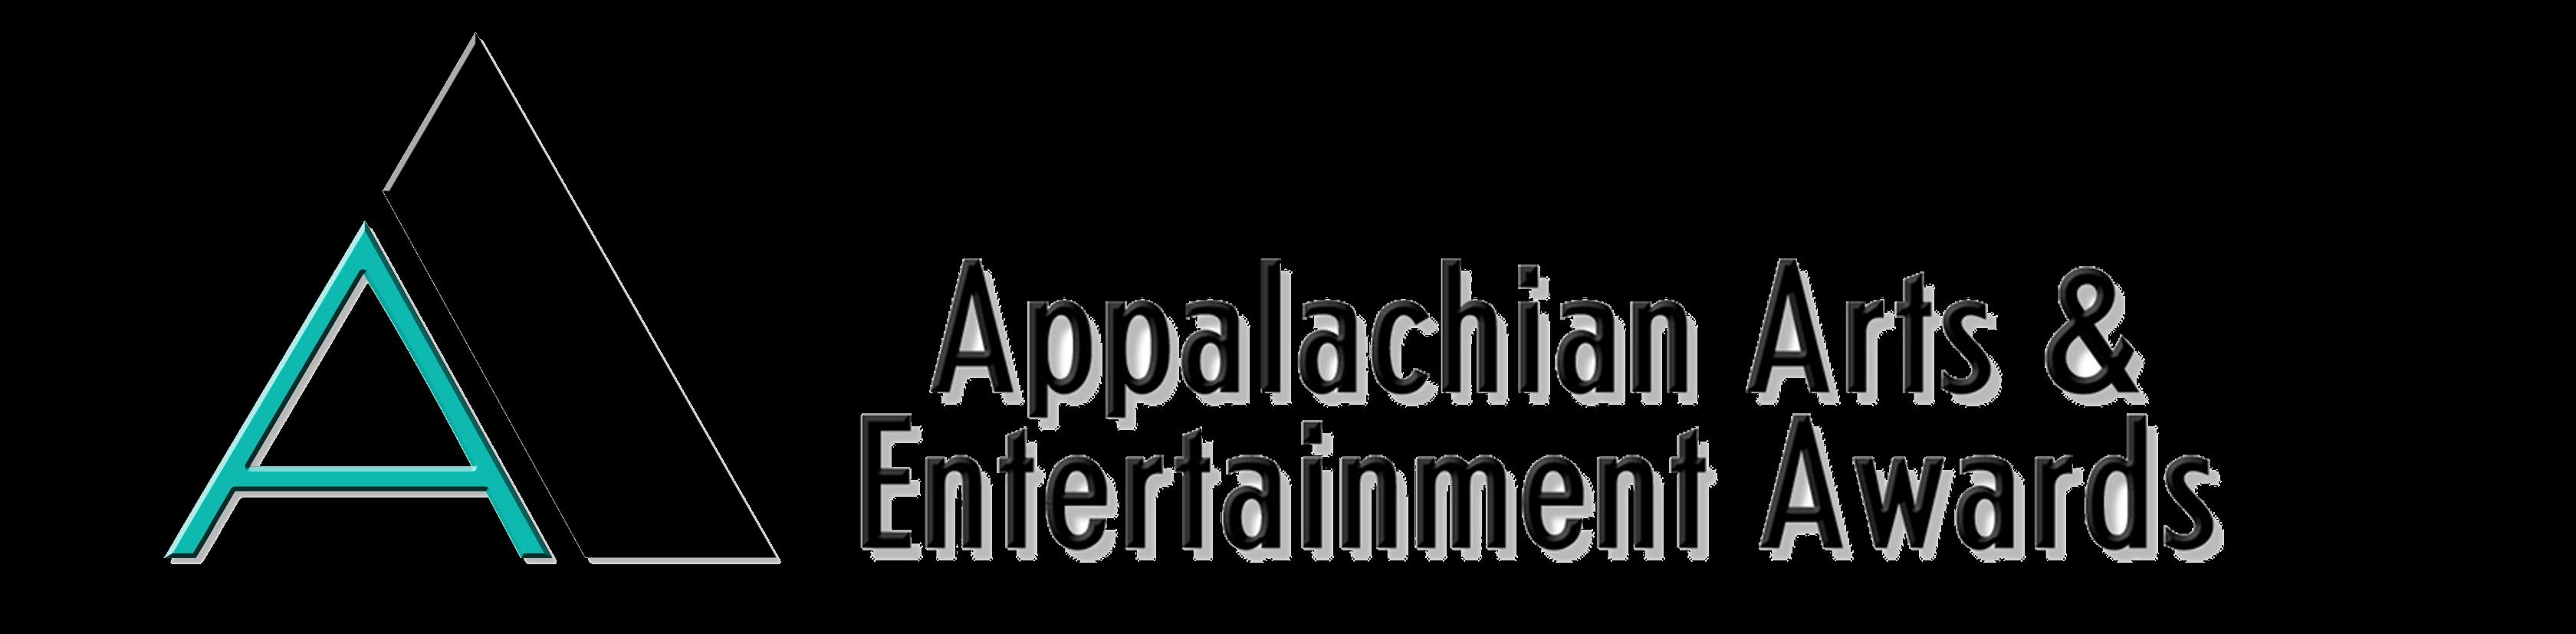 Appalachian Arts & Entertainment Awards